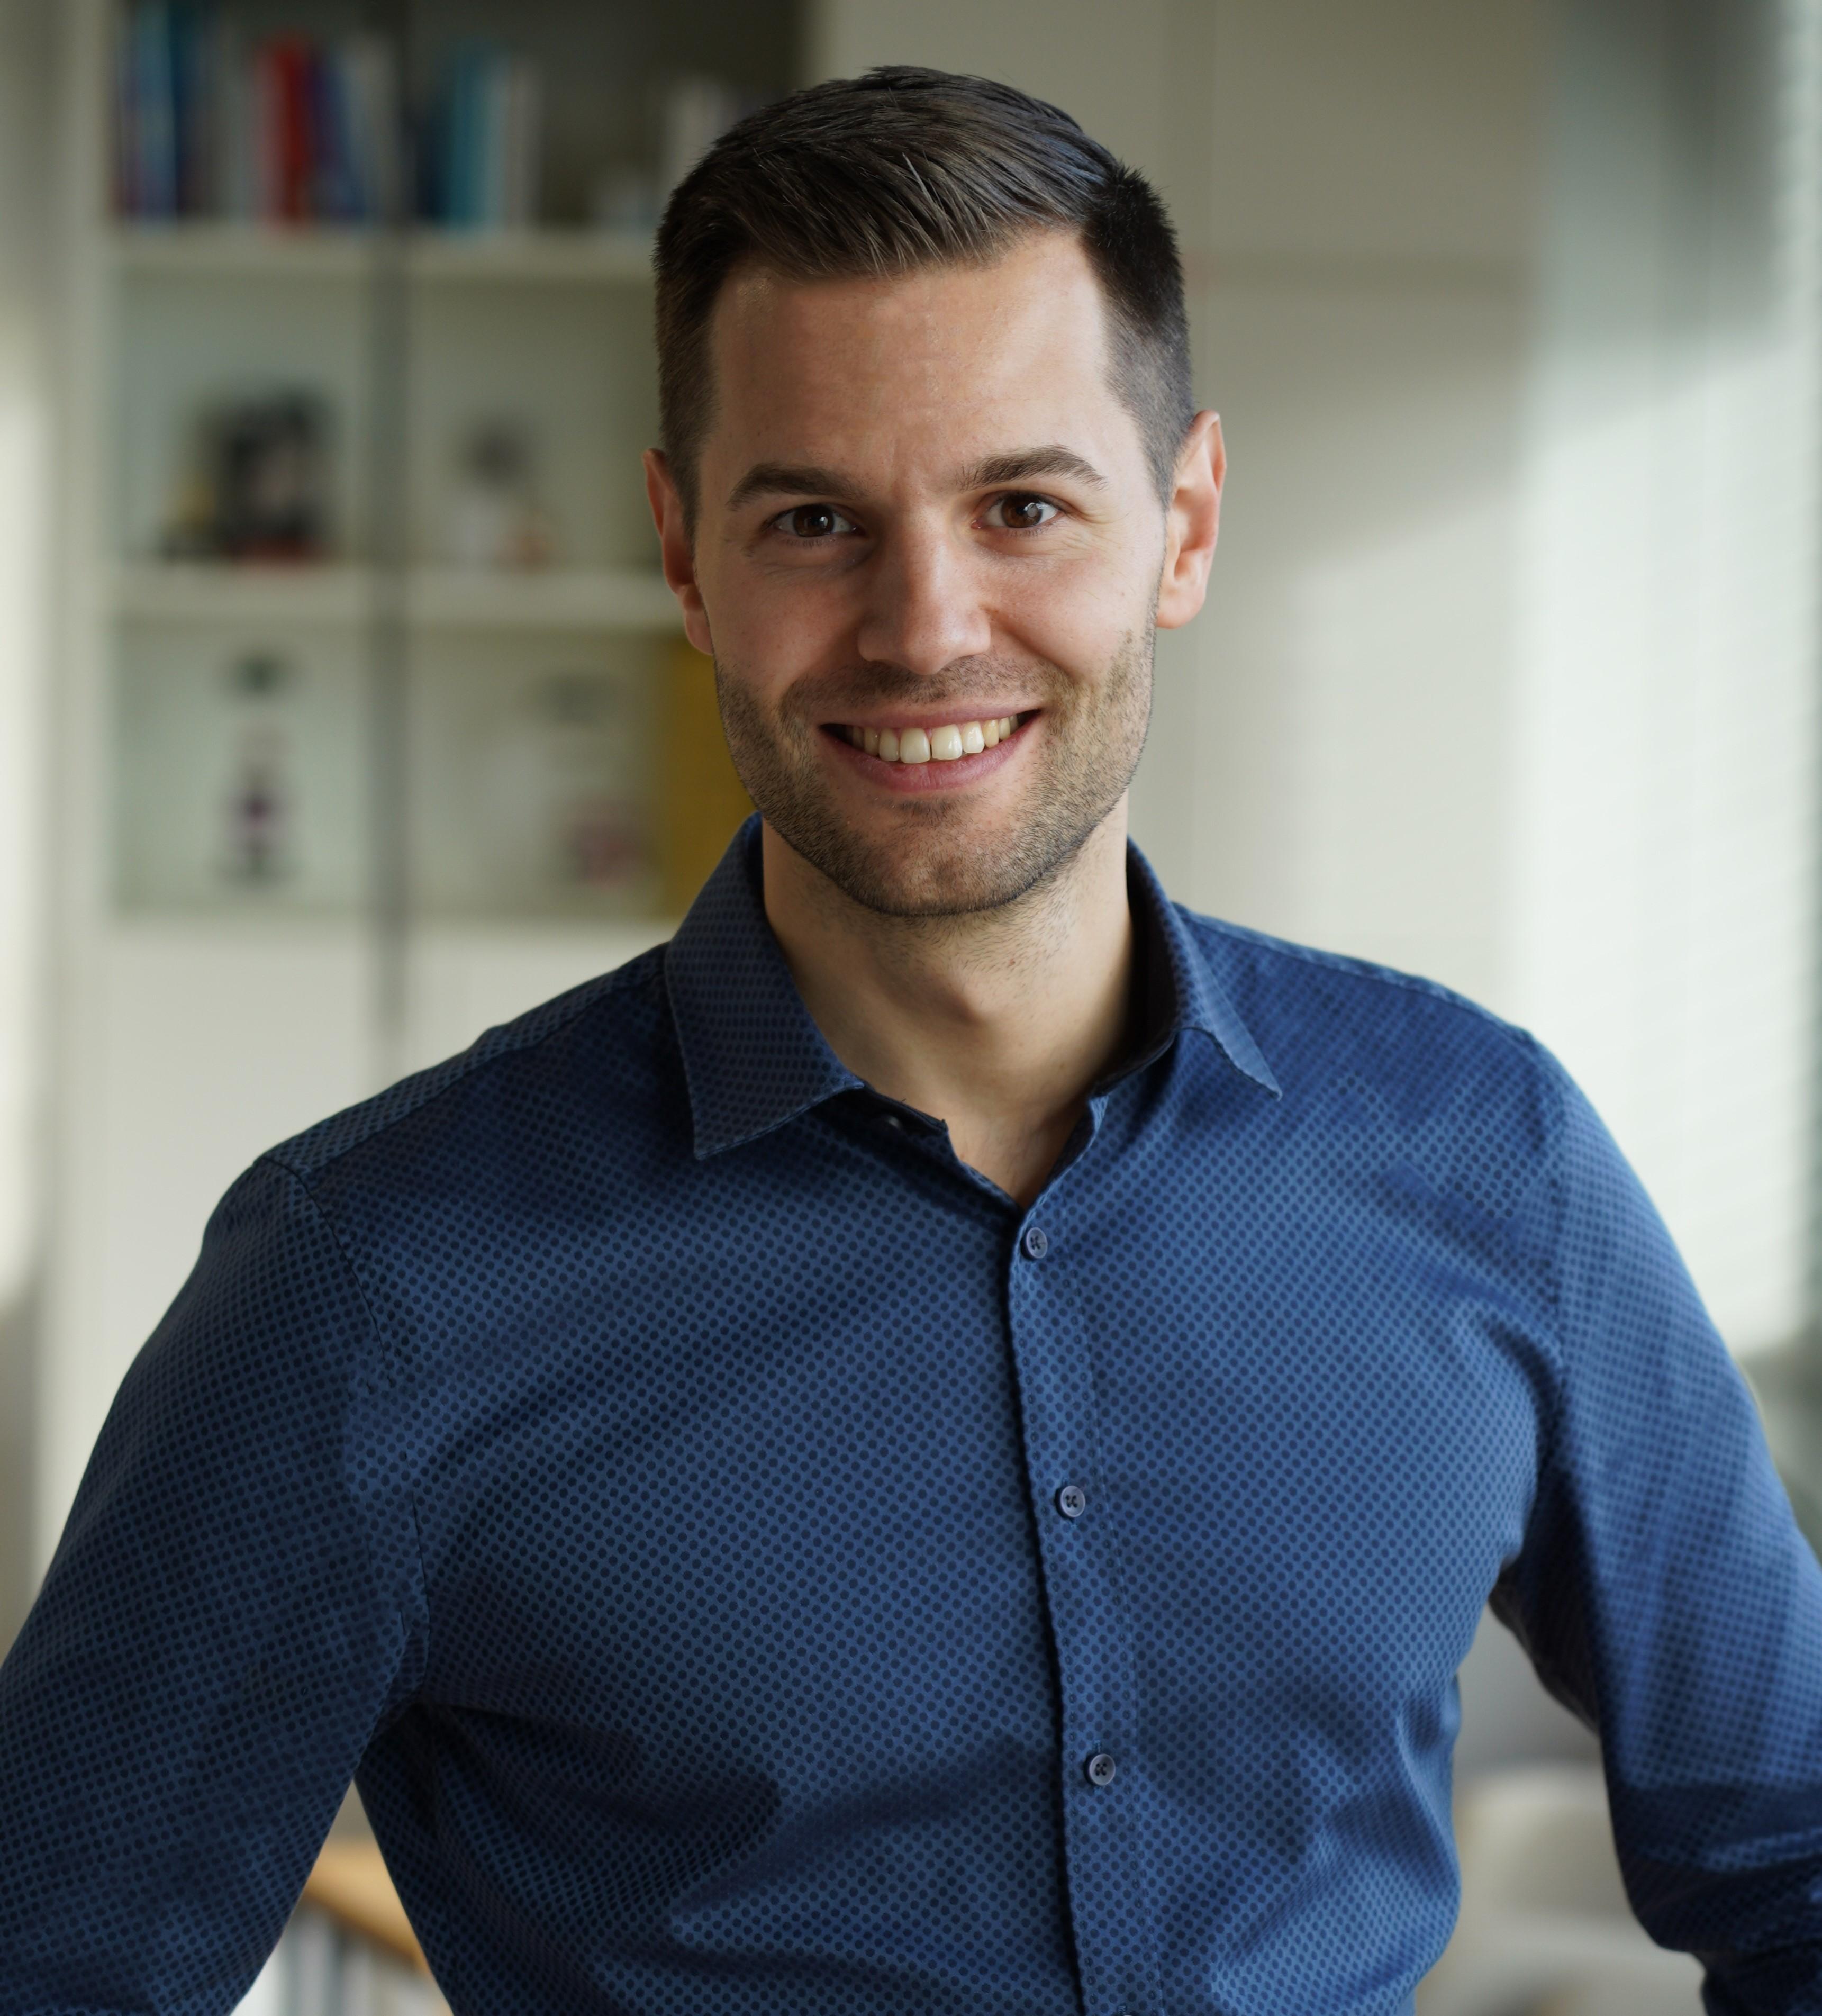 Jan Helwerth